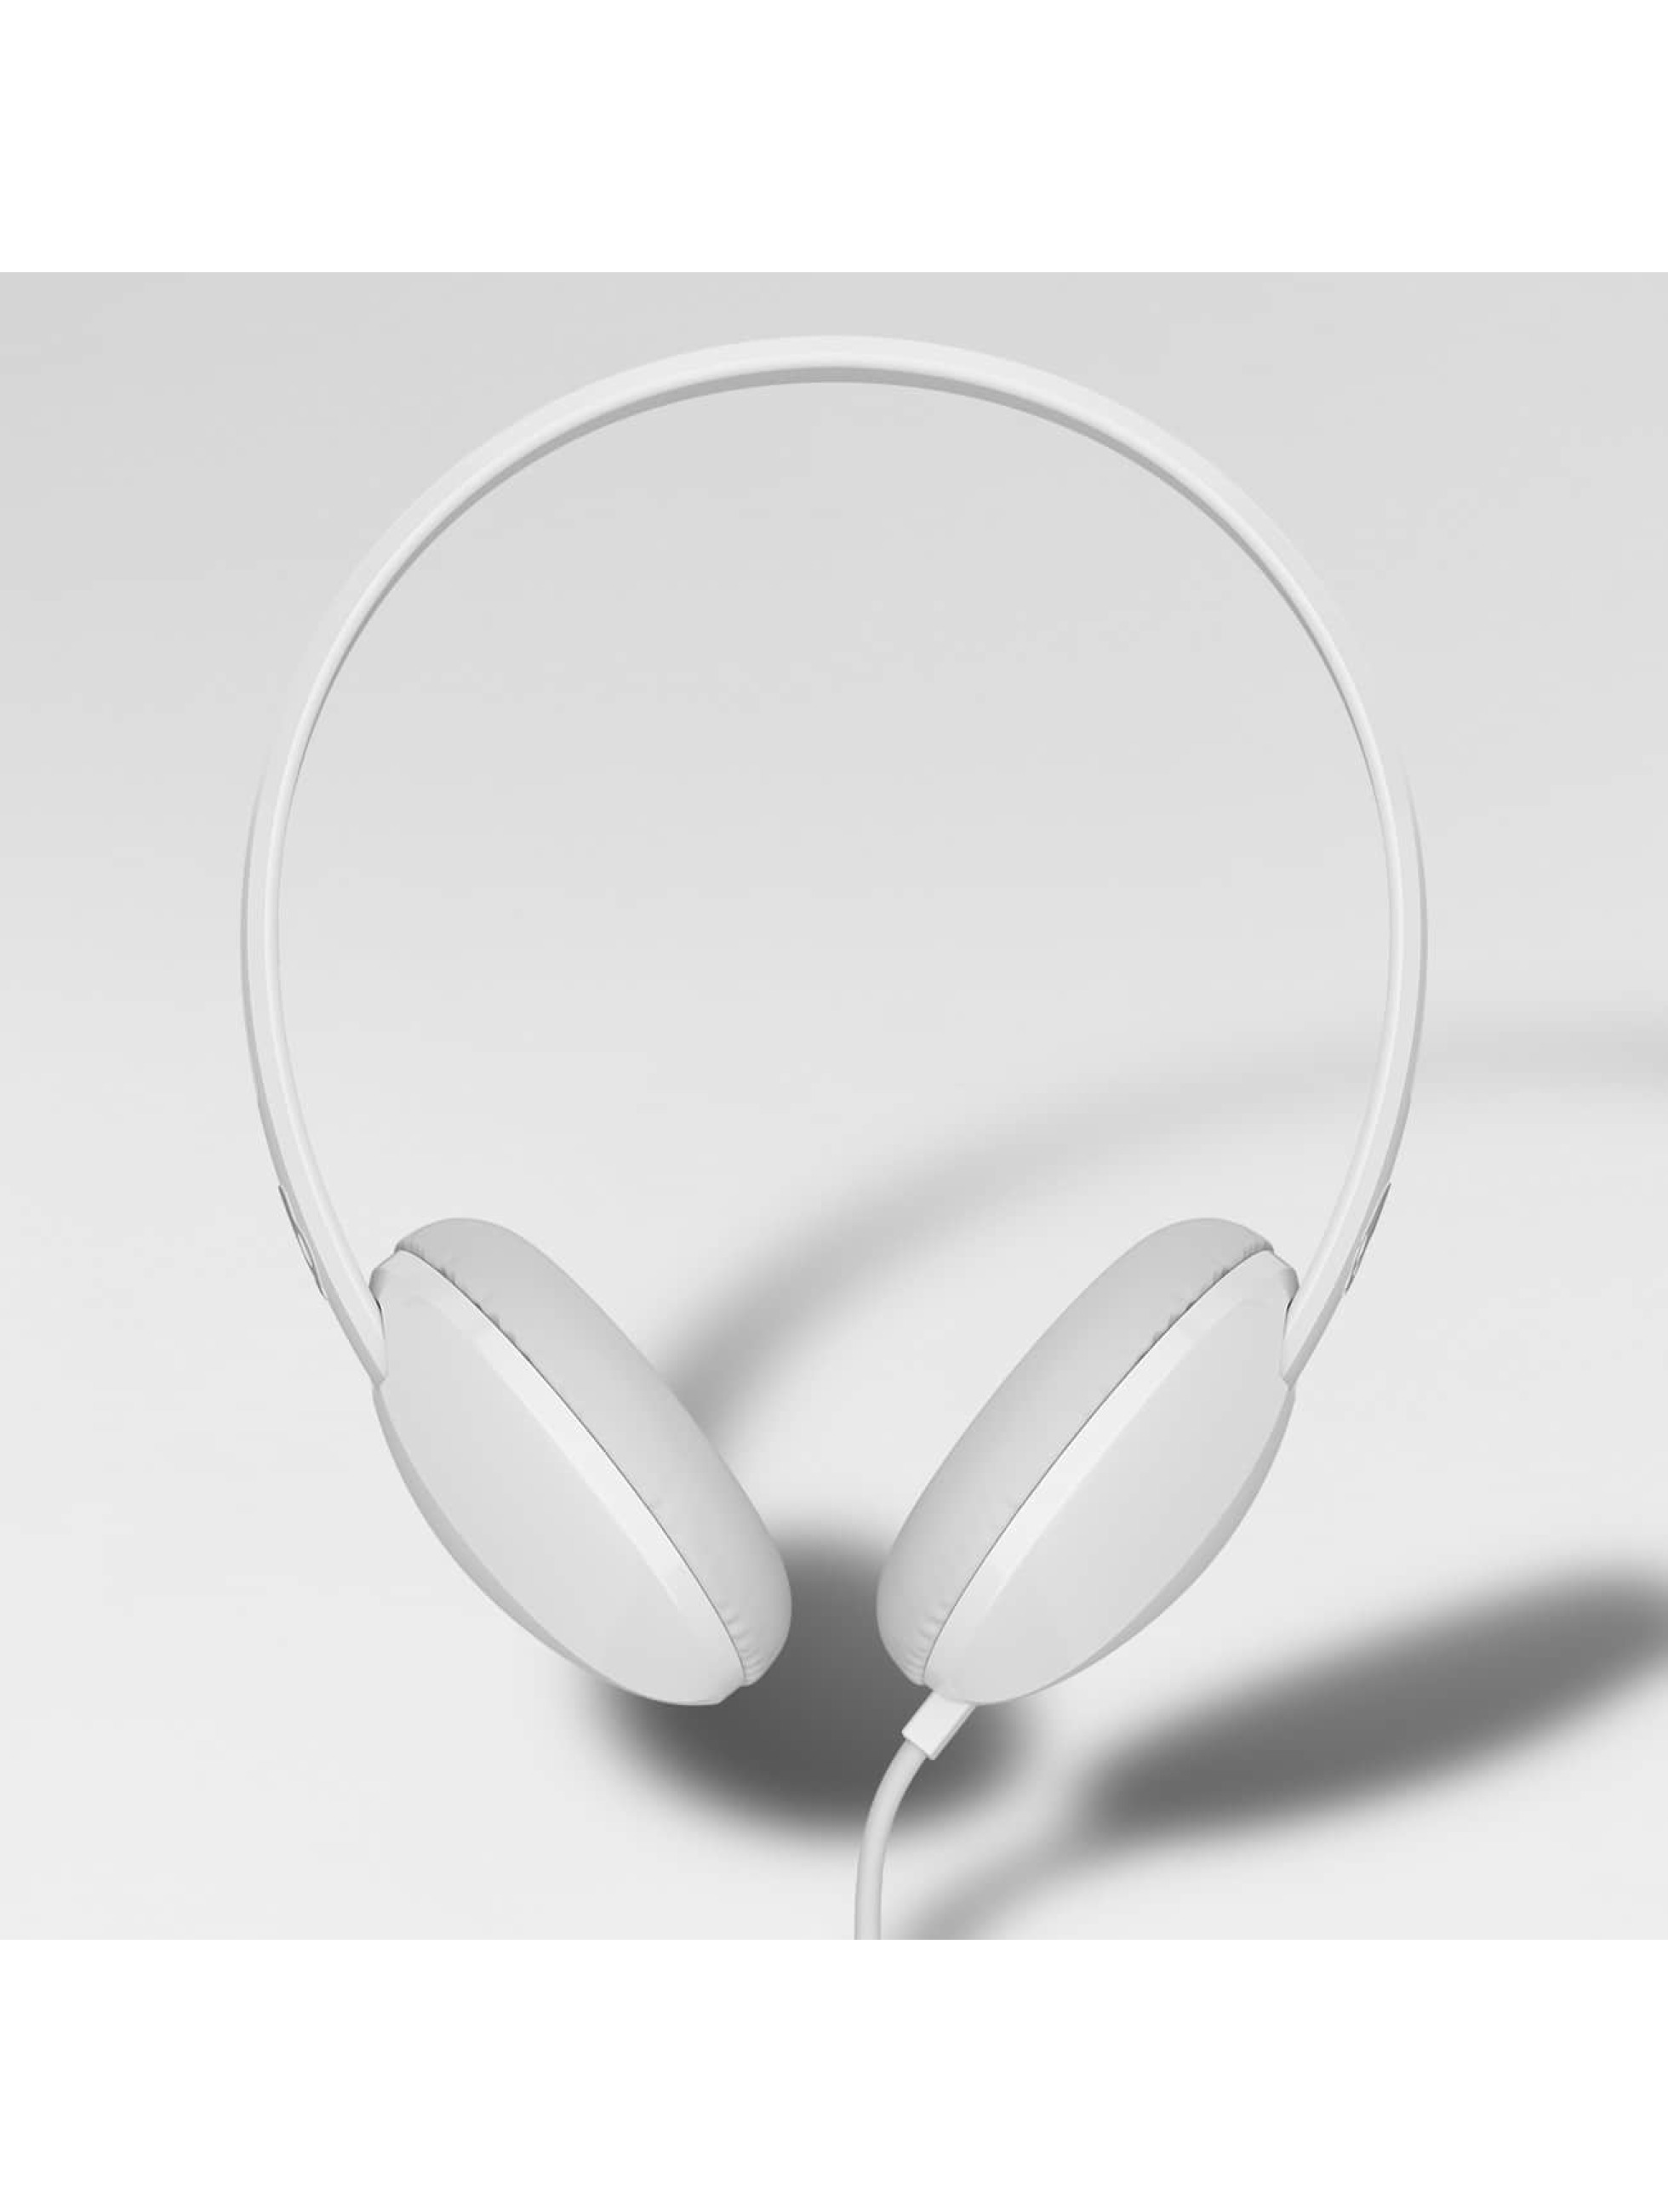 Skullcandy Auriculares Stim Mic 1 On Ear blanco